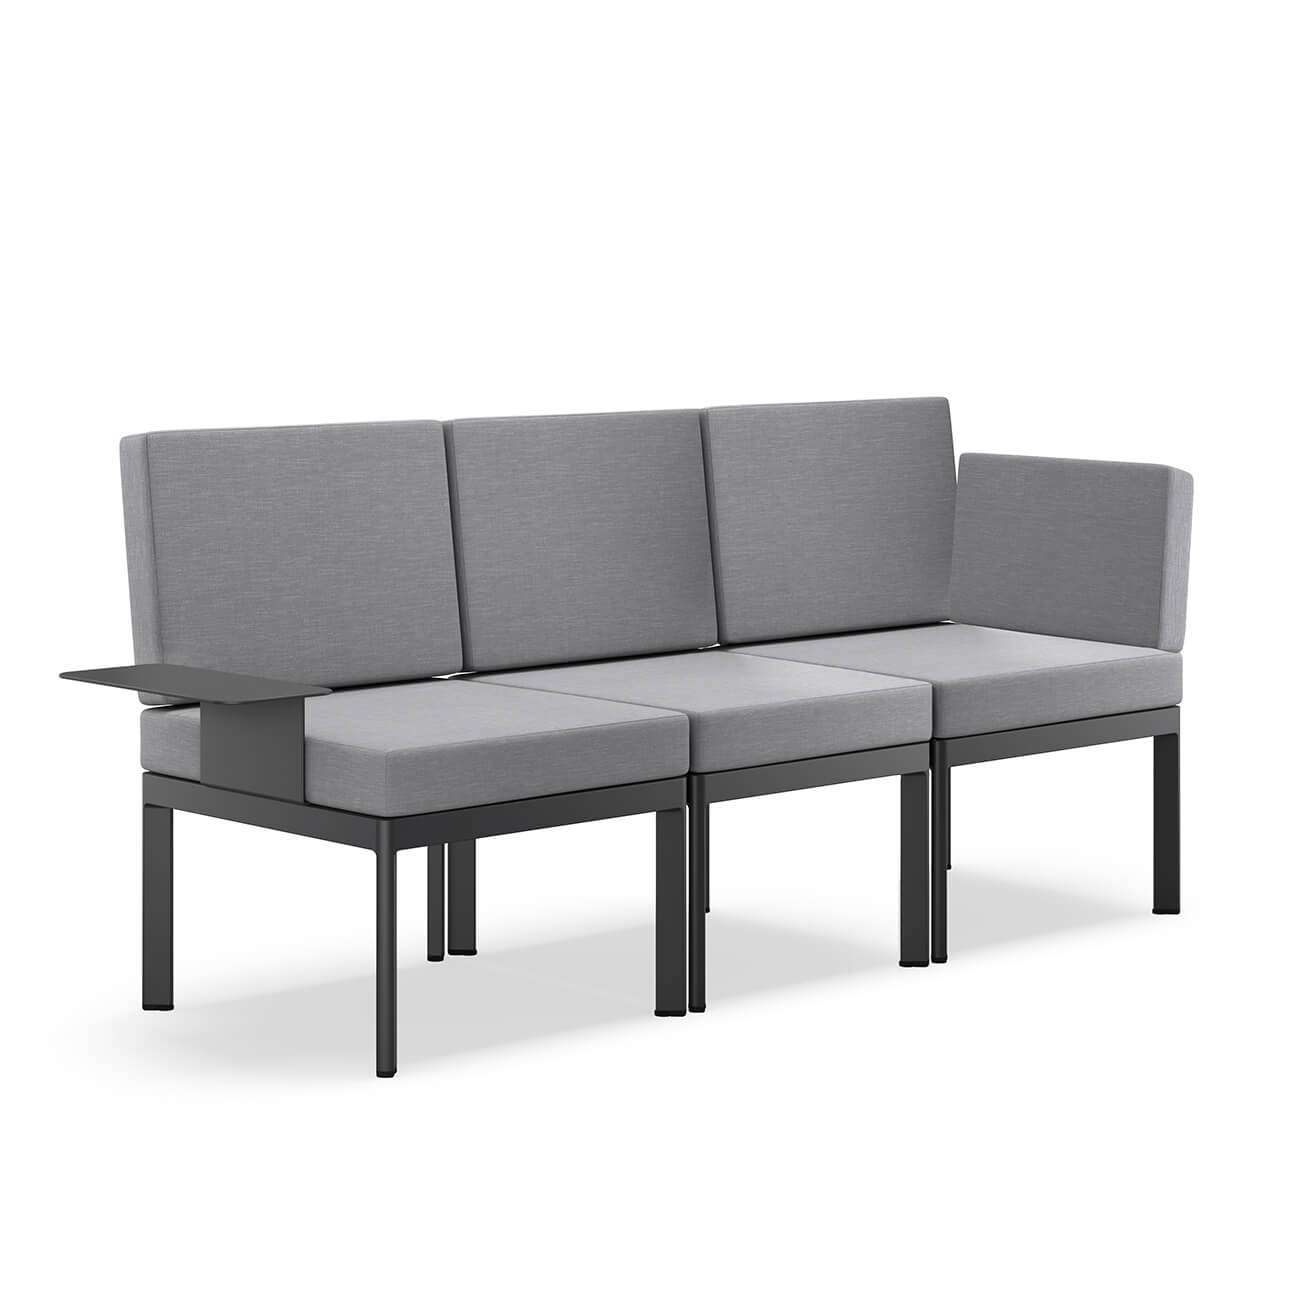 Градински триместен диван с масичка Lugo